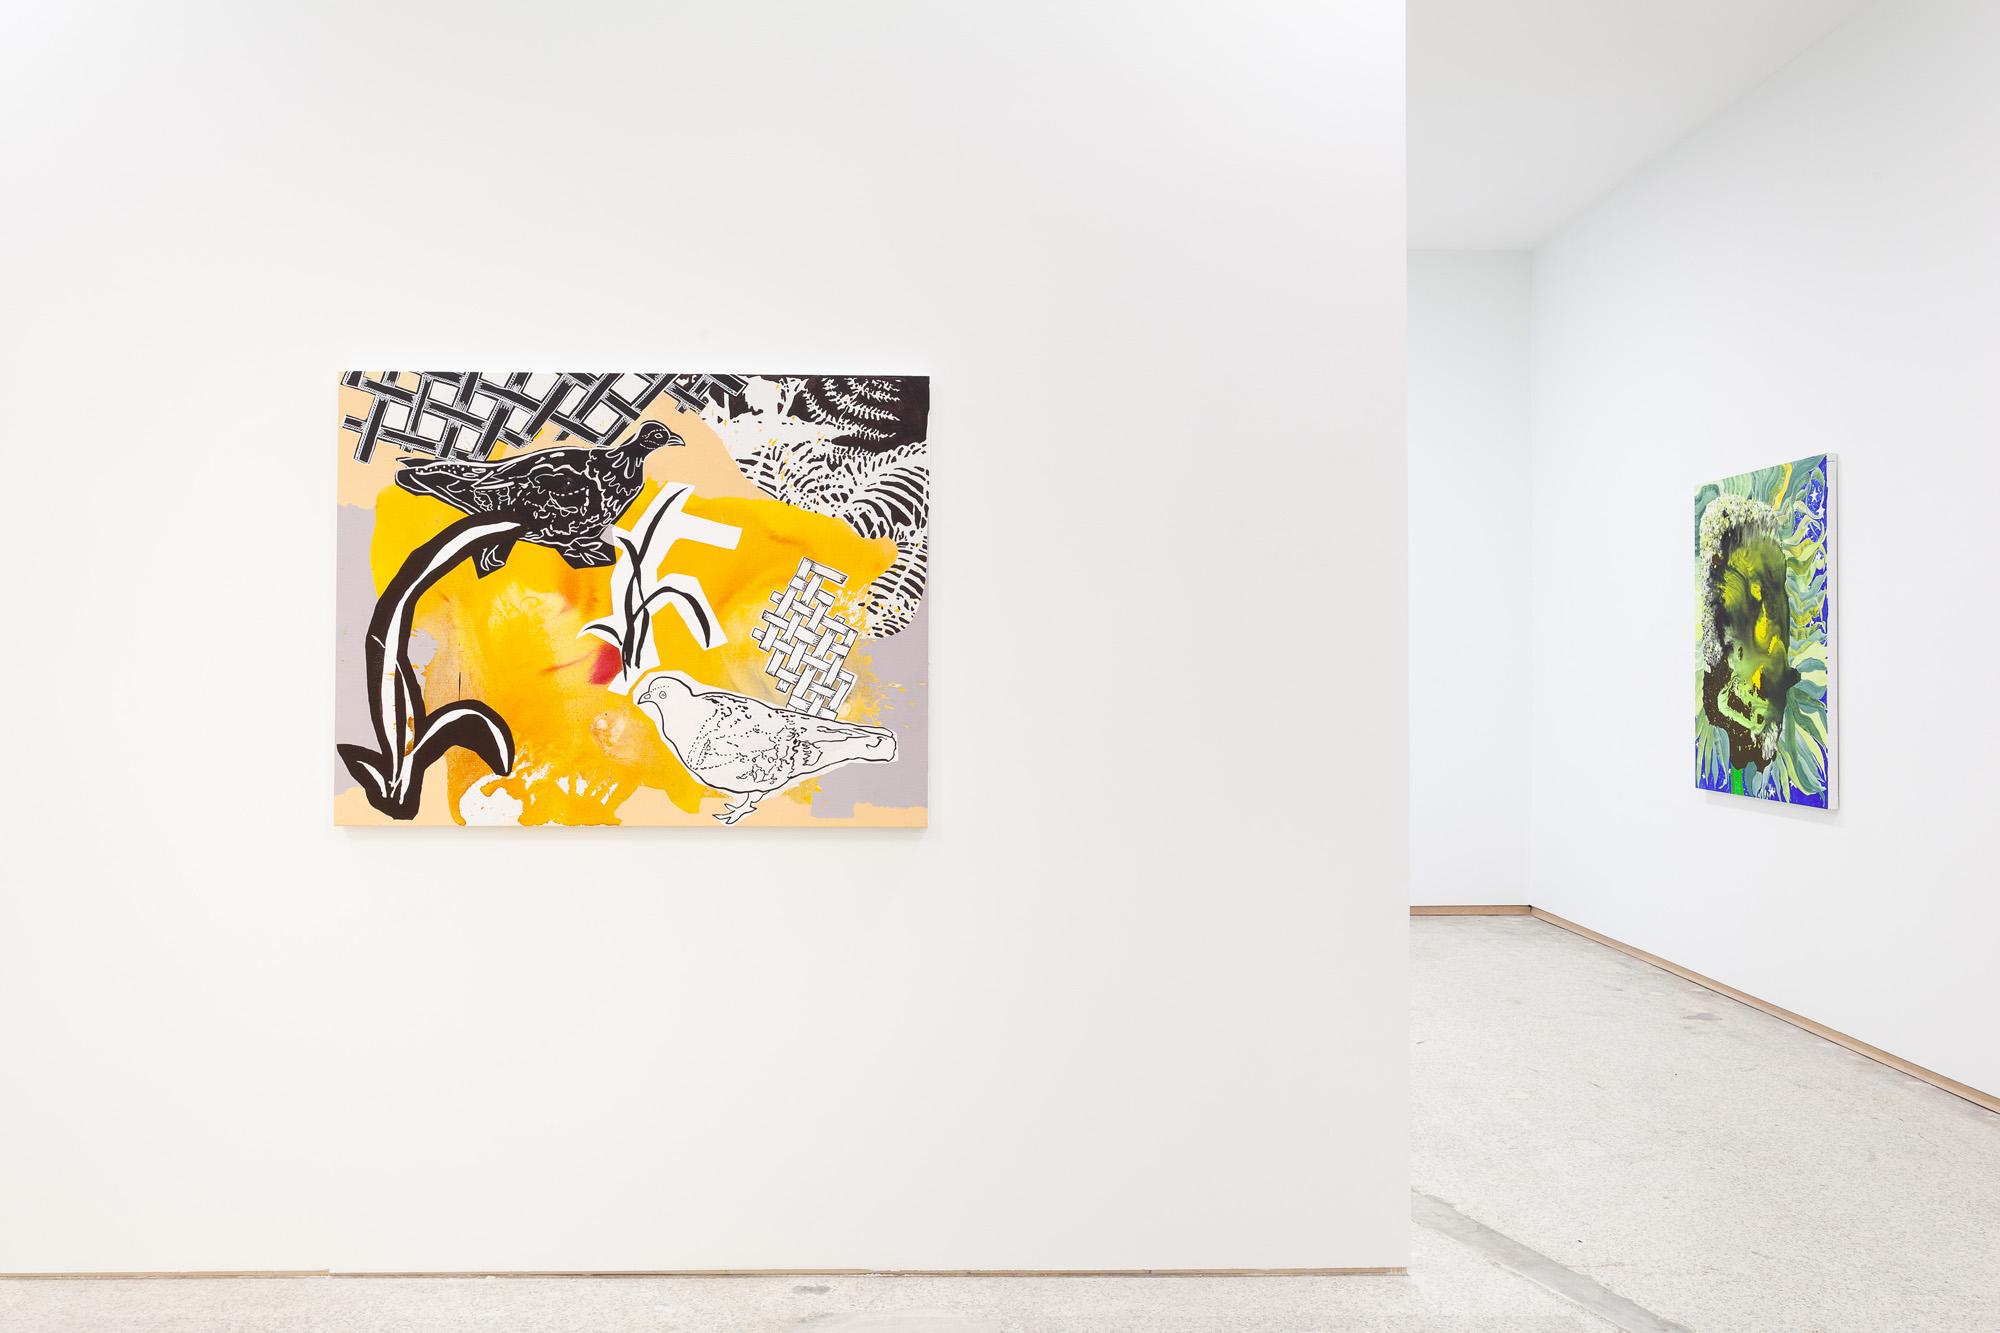 Elisabeth Condon, Effulgence (installation view), 2019